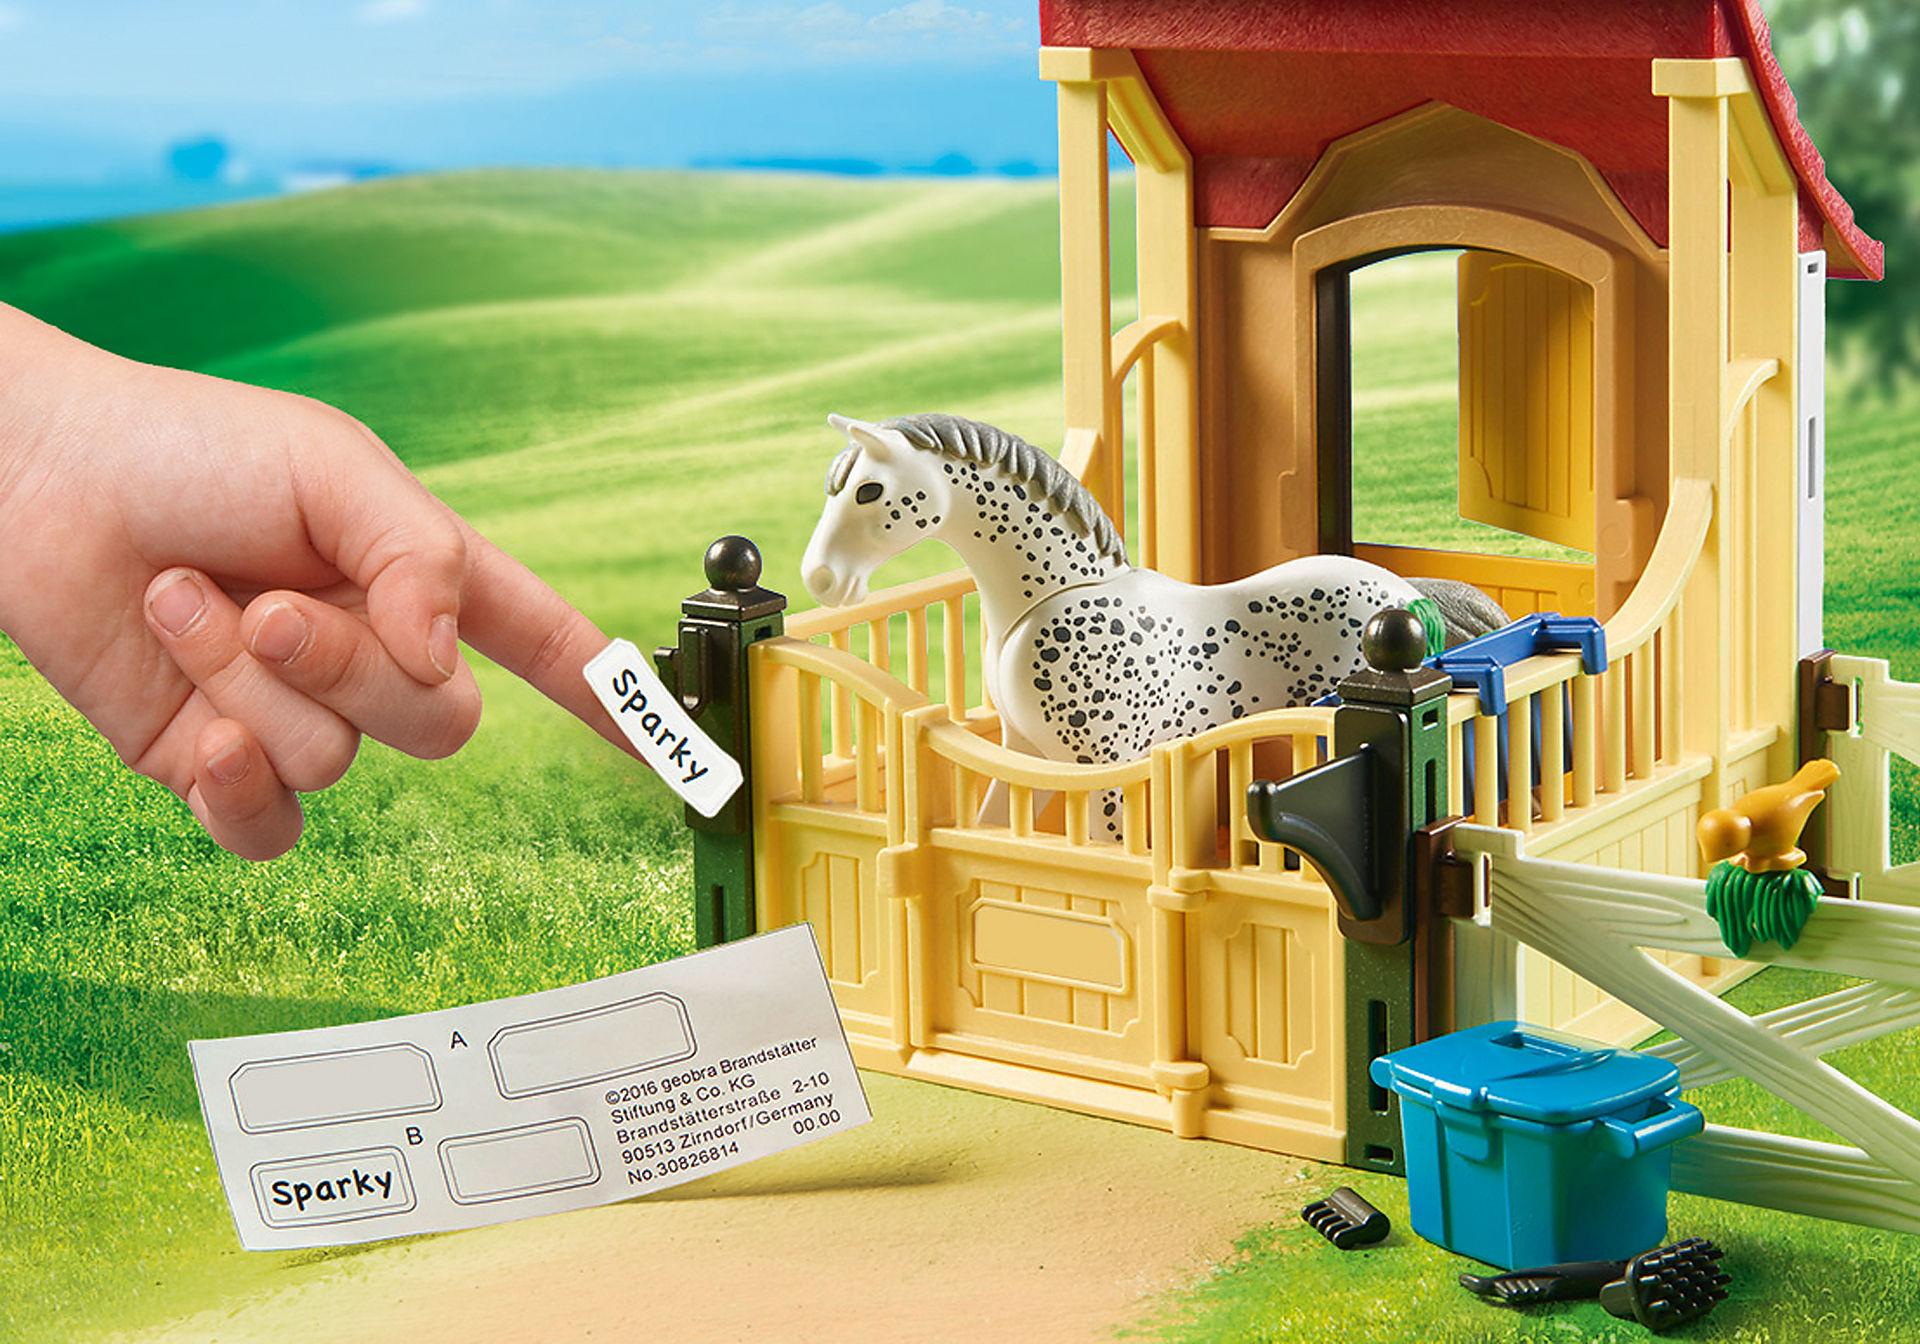 http://media.playmobil.com/i/playmobil/6935_product_extra1/Appaloosa met paardenbox